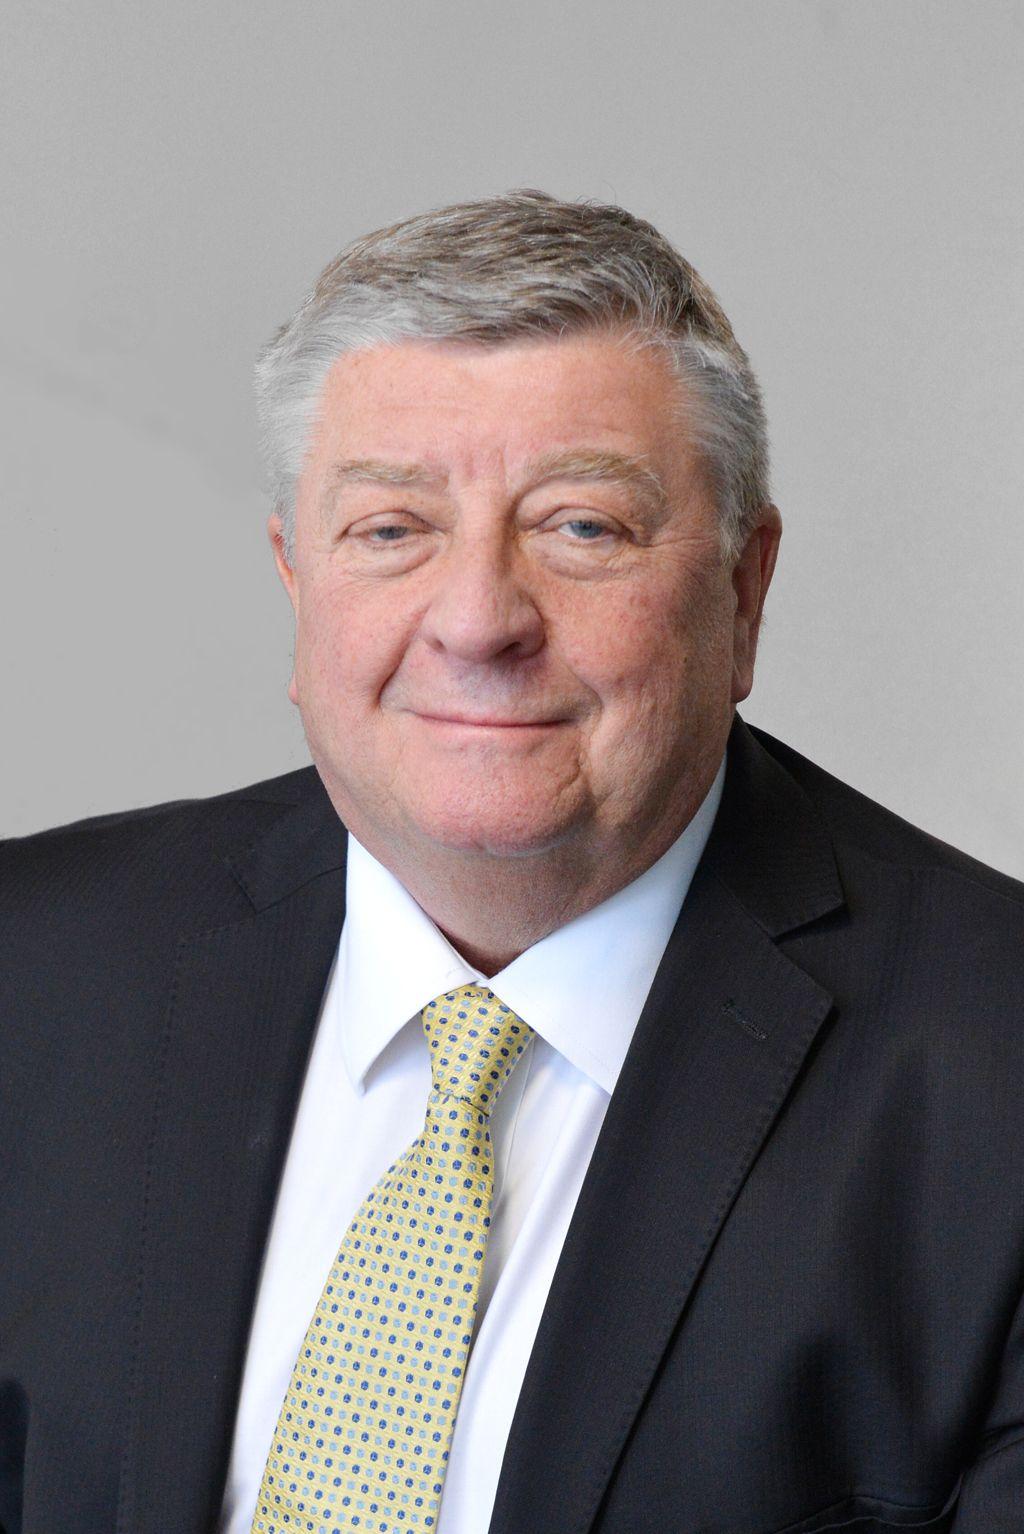 Dr Mark Payton